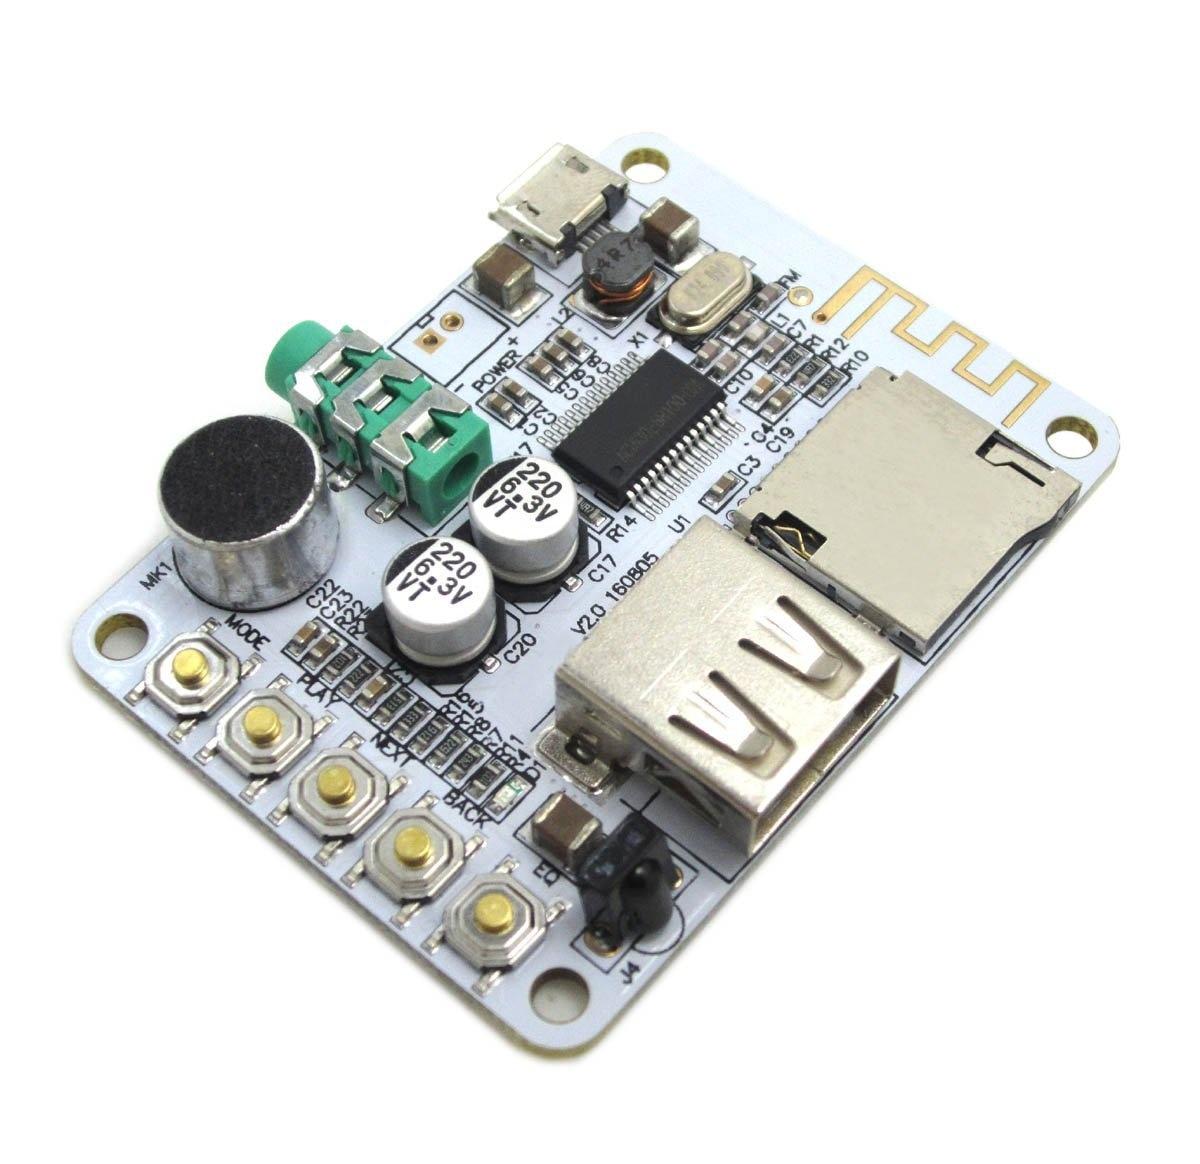 Bluetooth Audio Receiver Board /AUX Car Audio Modification / Lossless Bluetooth Receiver /MP3 Decoder Board